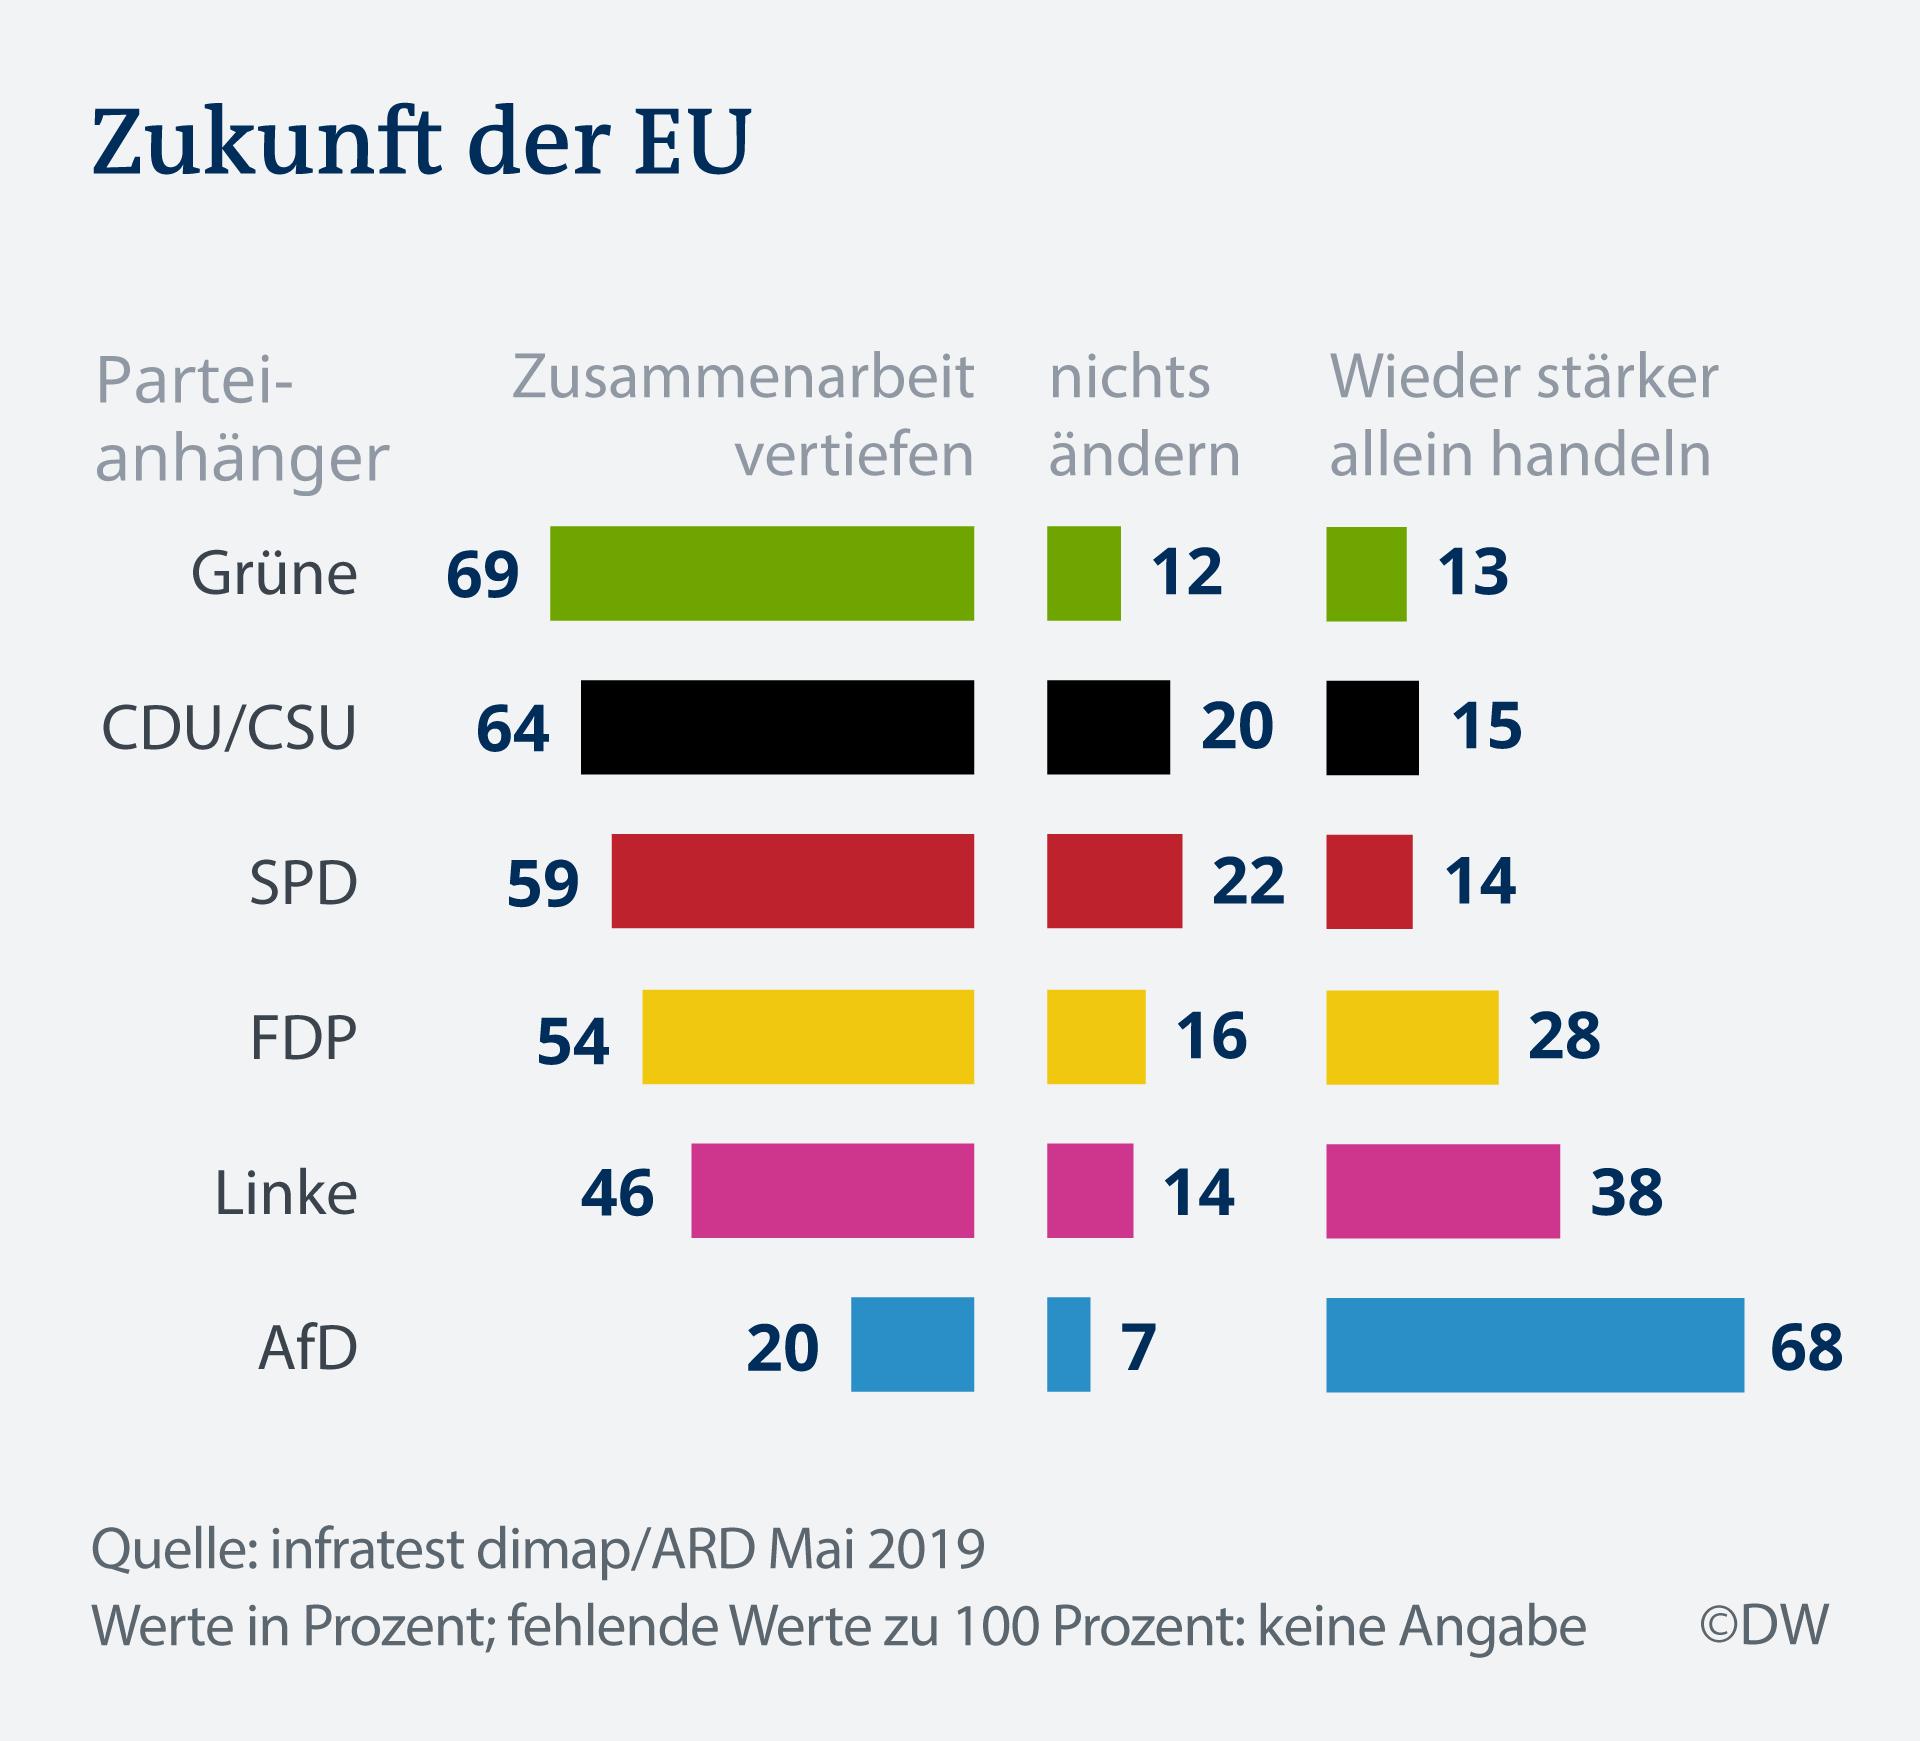 Infografik Deutschland Trend Zukunft der EU DE